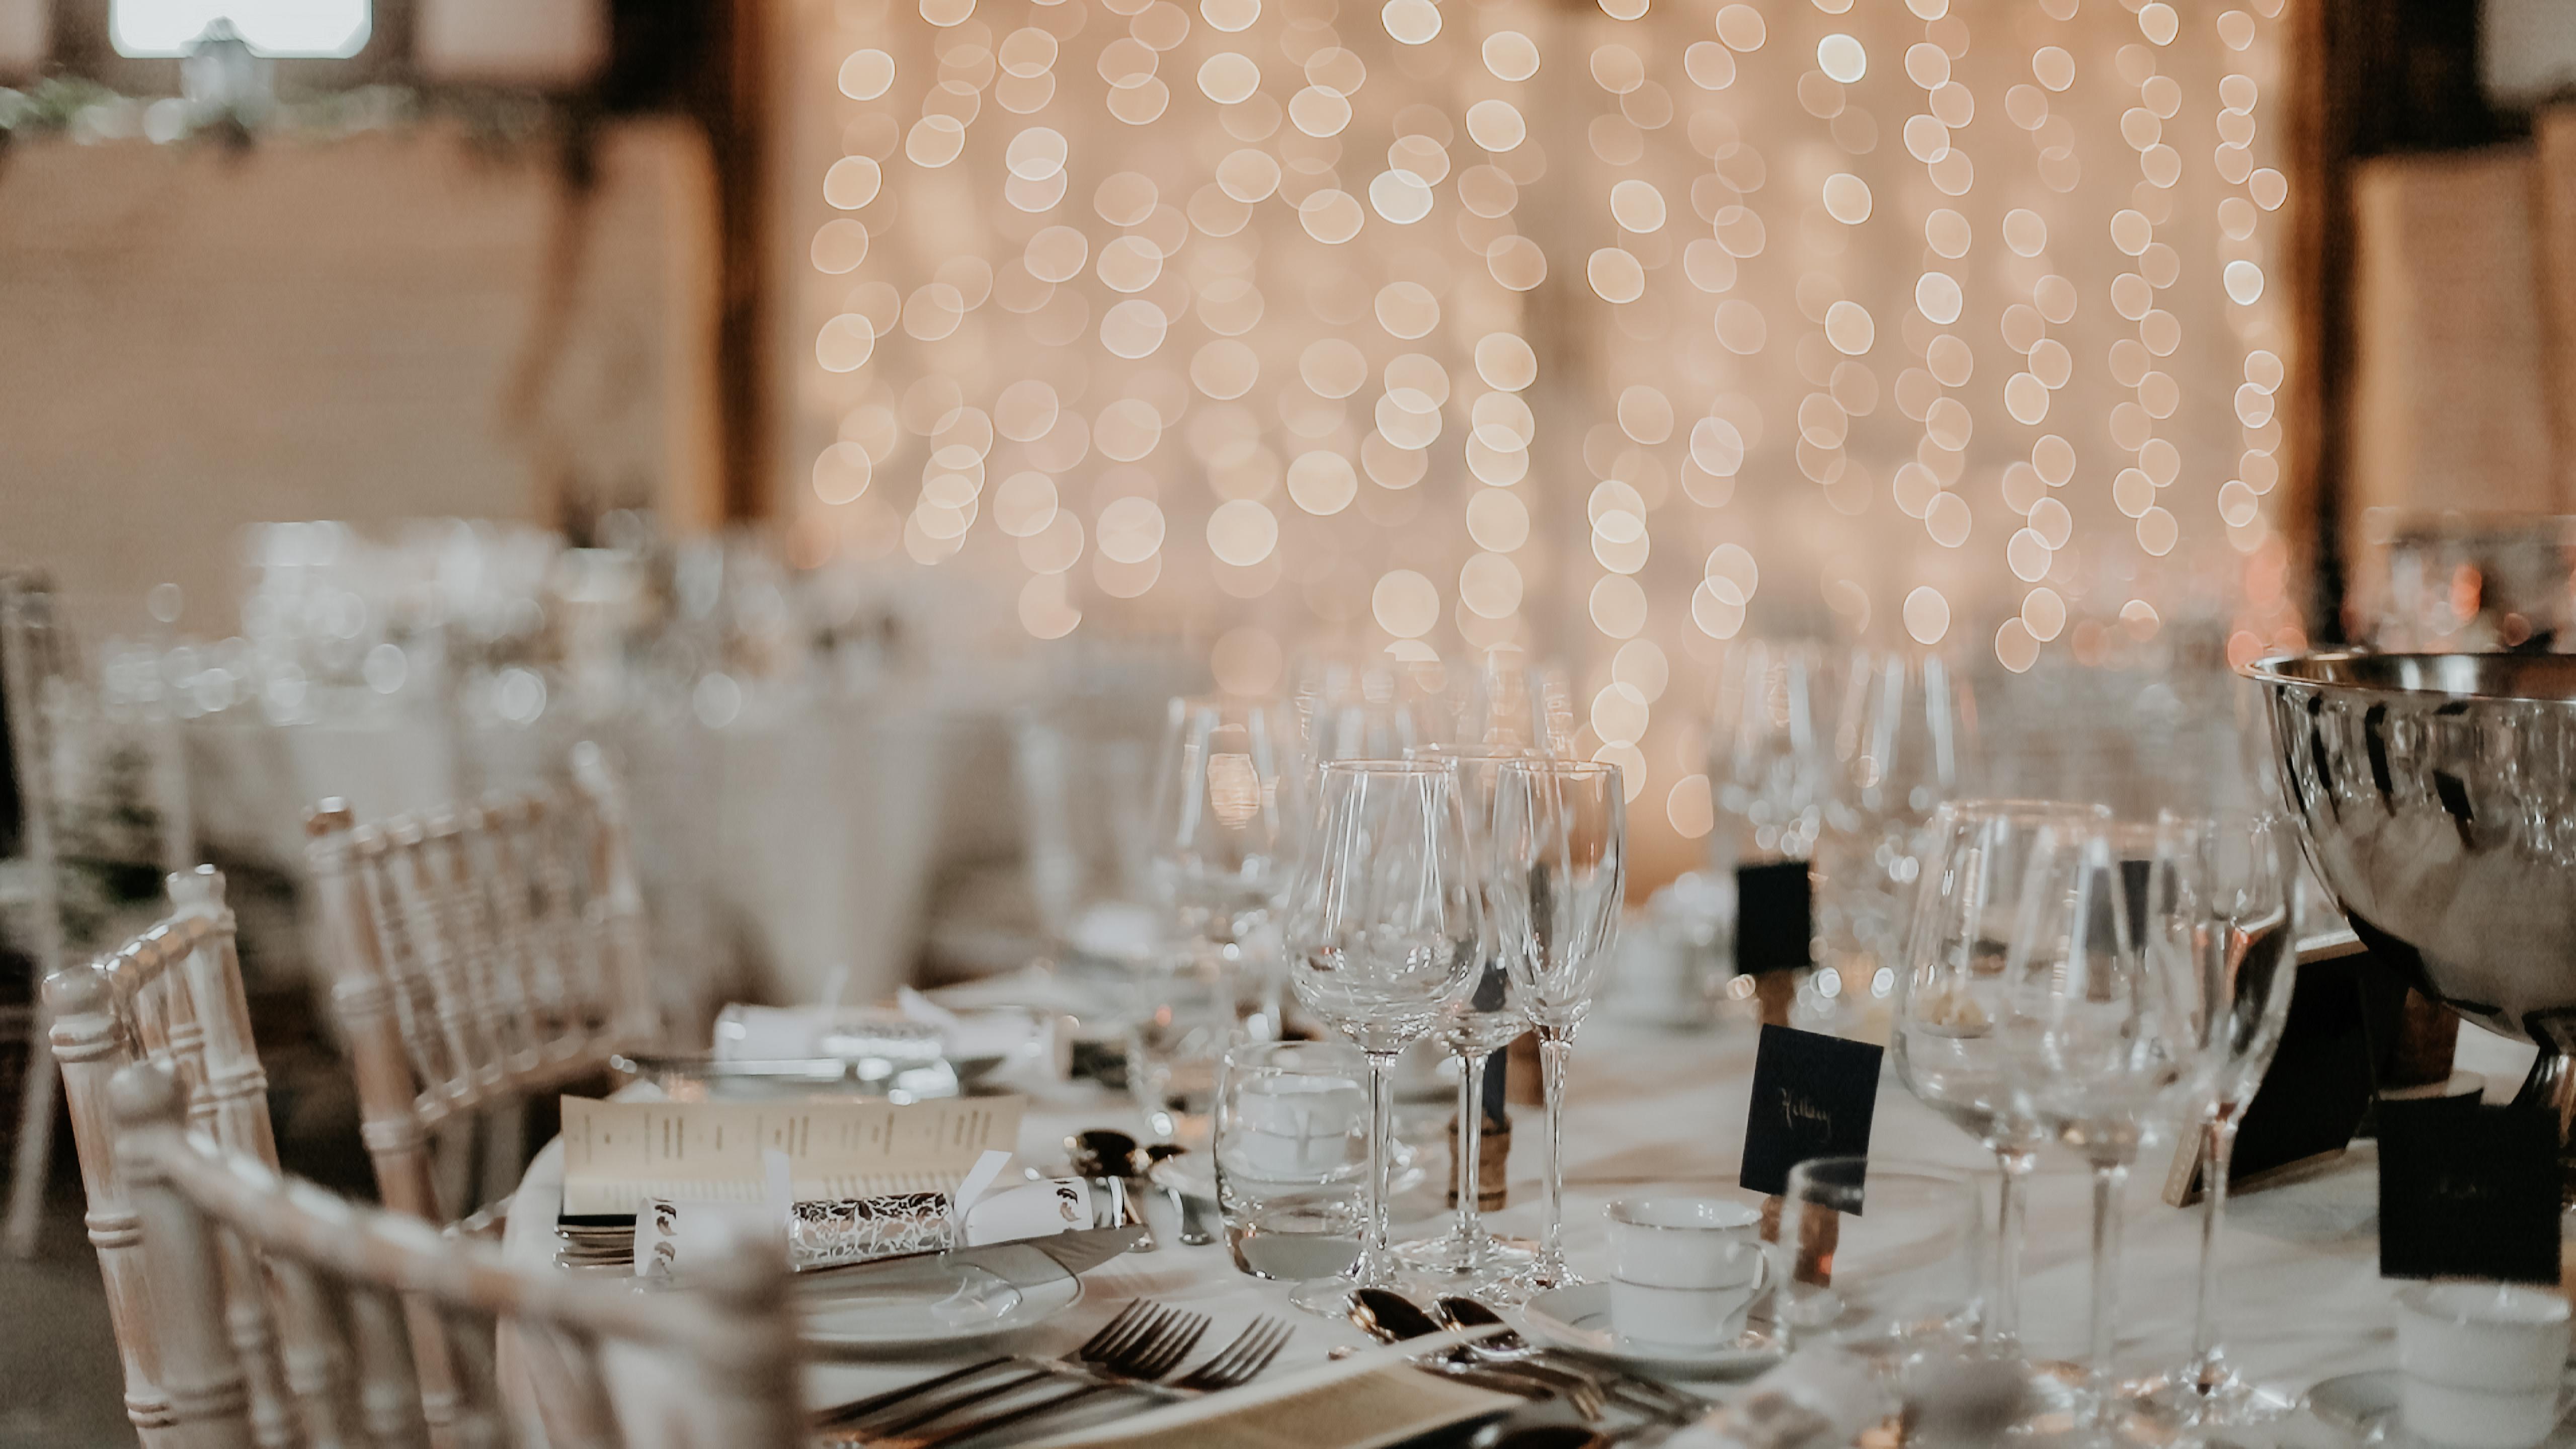 Wedding breakfast table set up